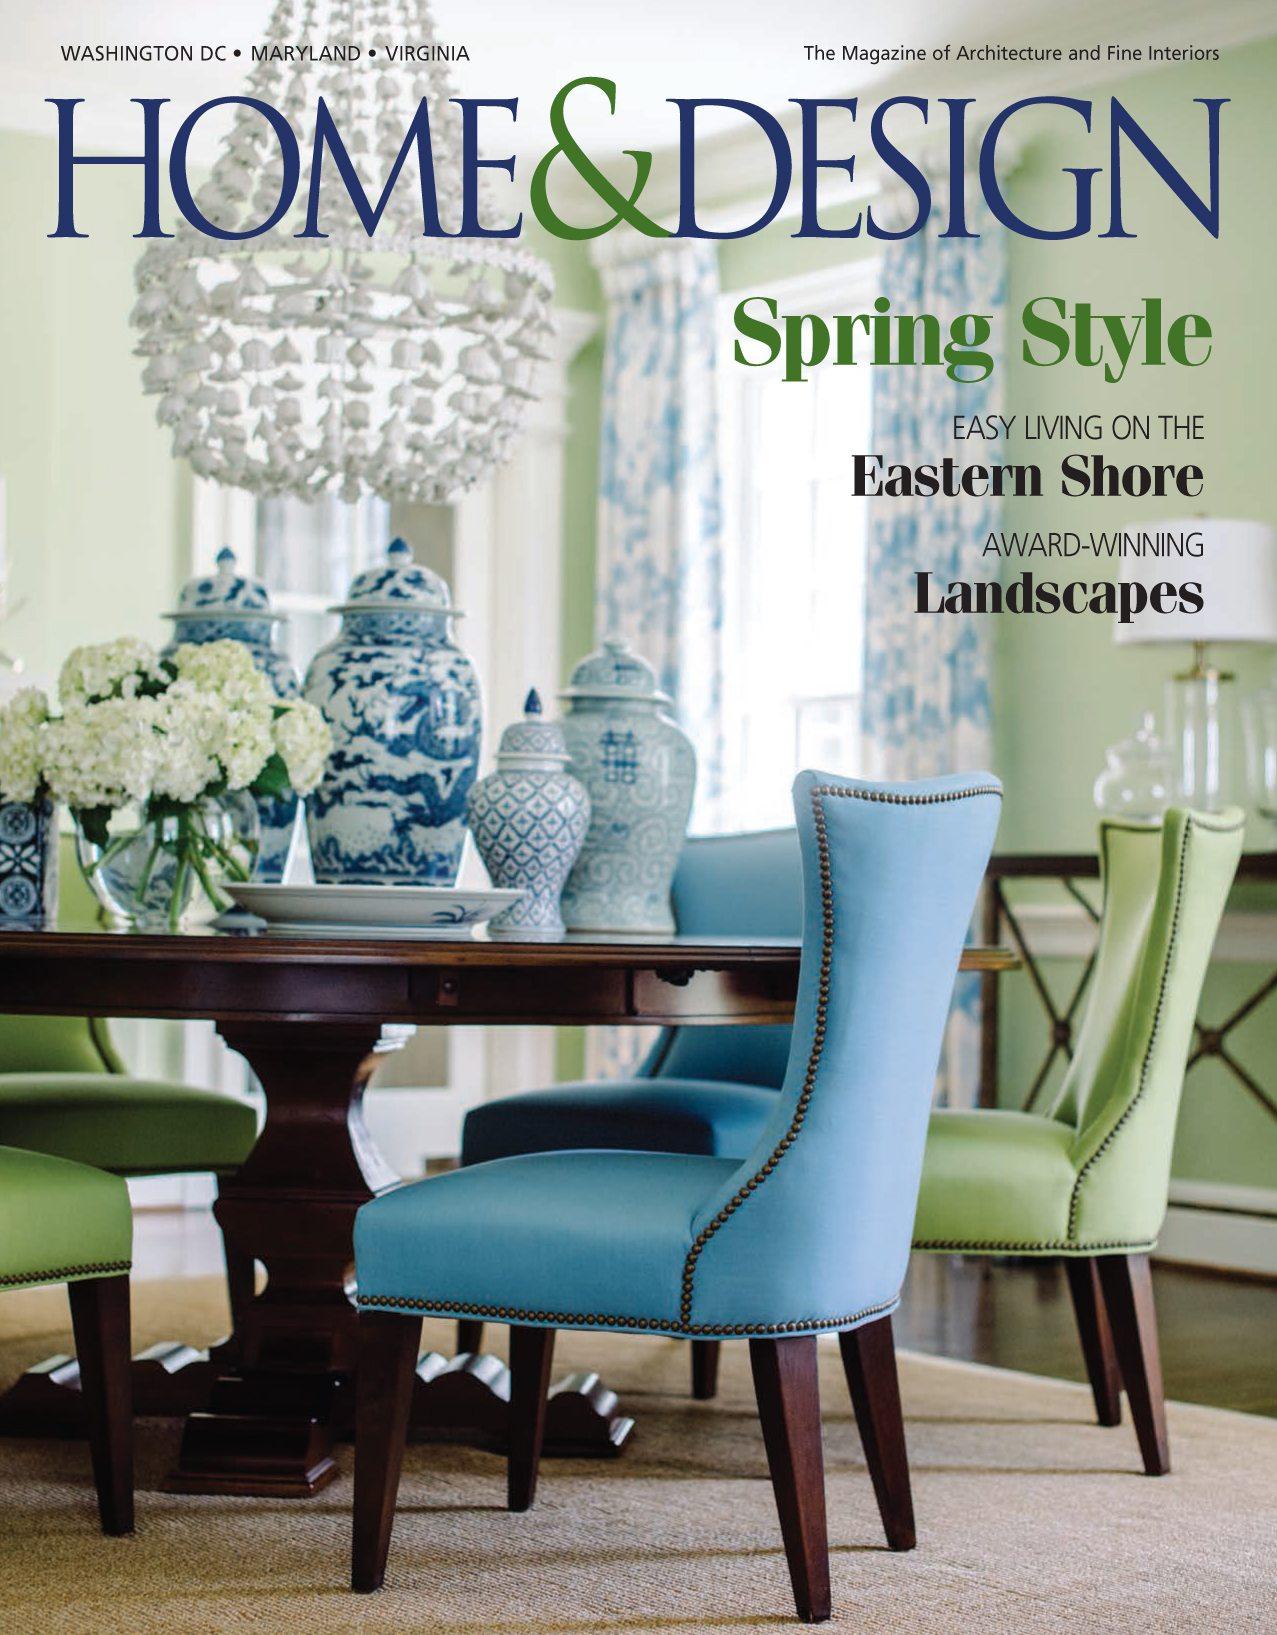 March April 2016 Archives Home & Design Magazine